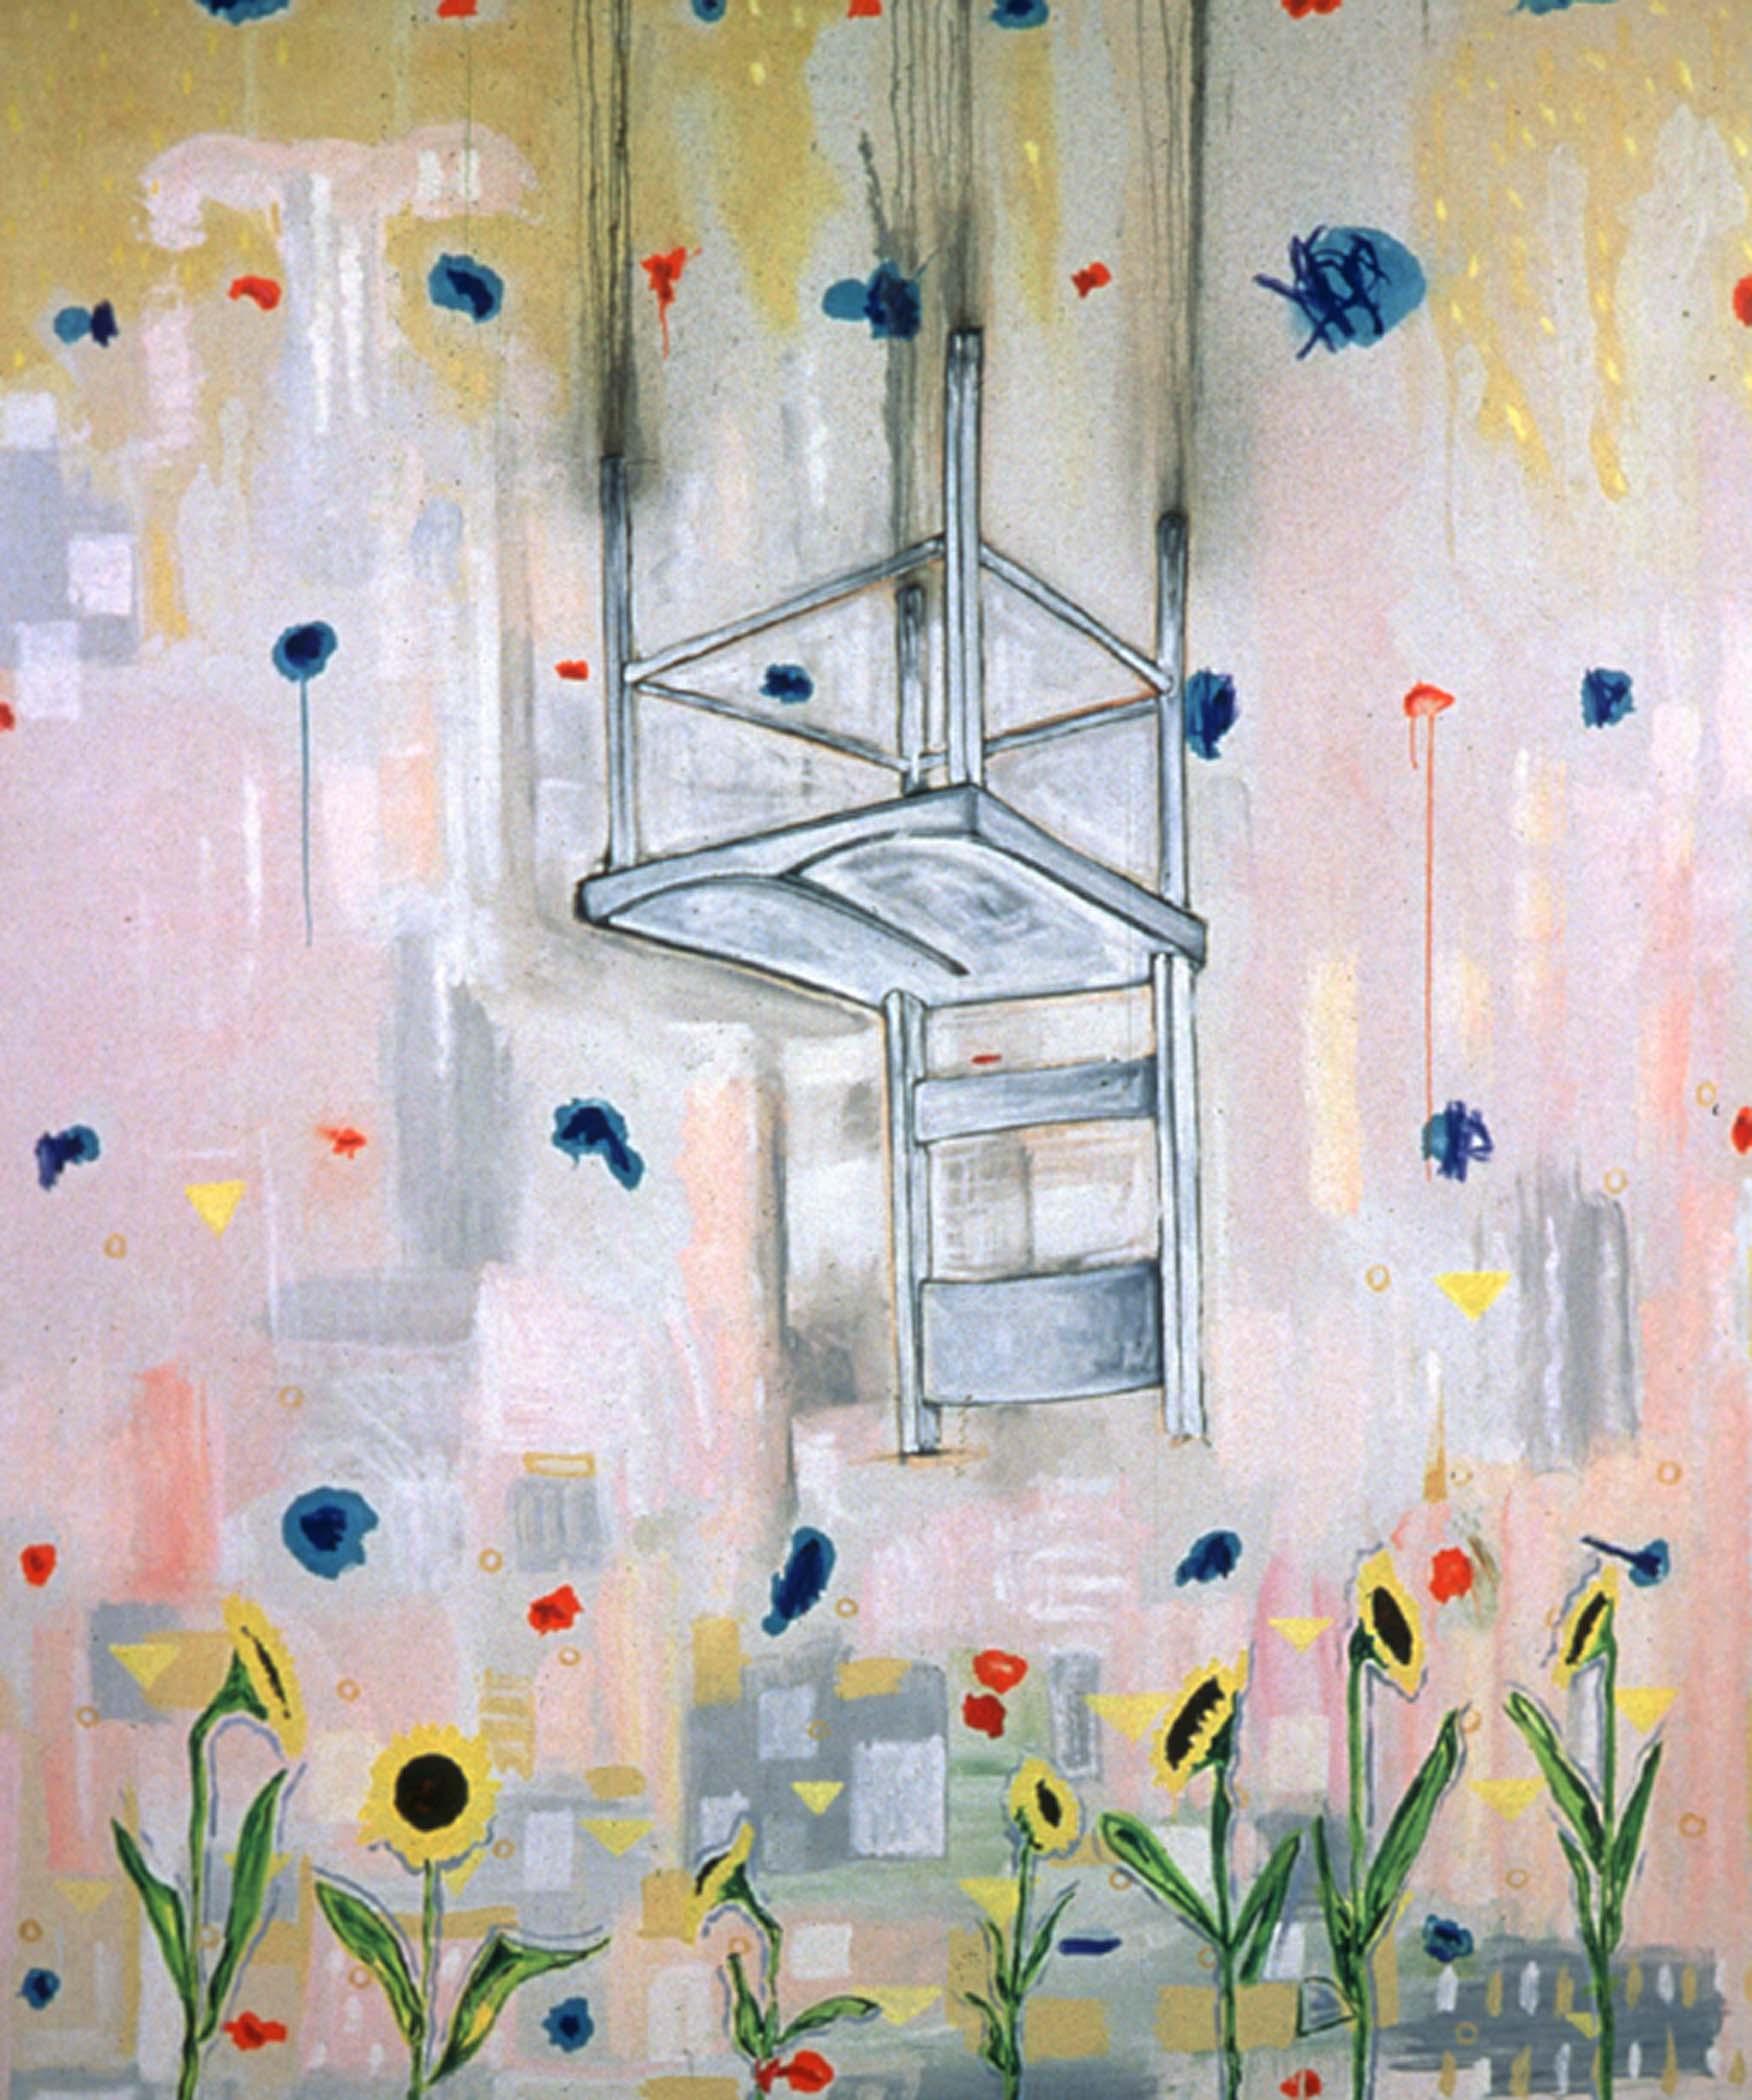 "Ex cathedra,  2000, huile sur toile / oil on canvas, 68""x 80"", 172 x 203 cm."